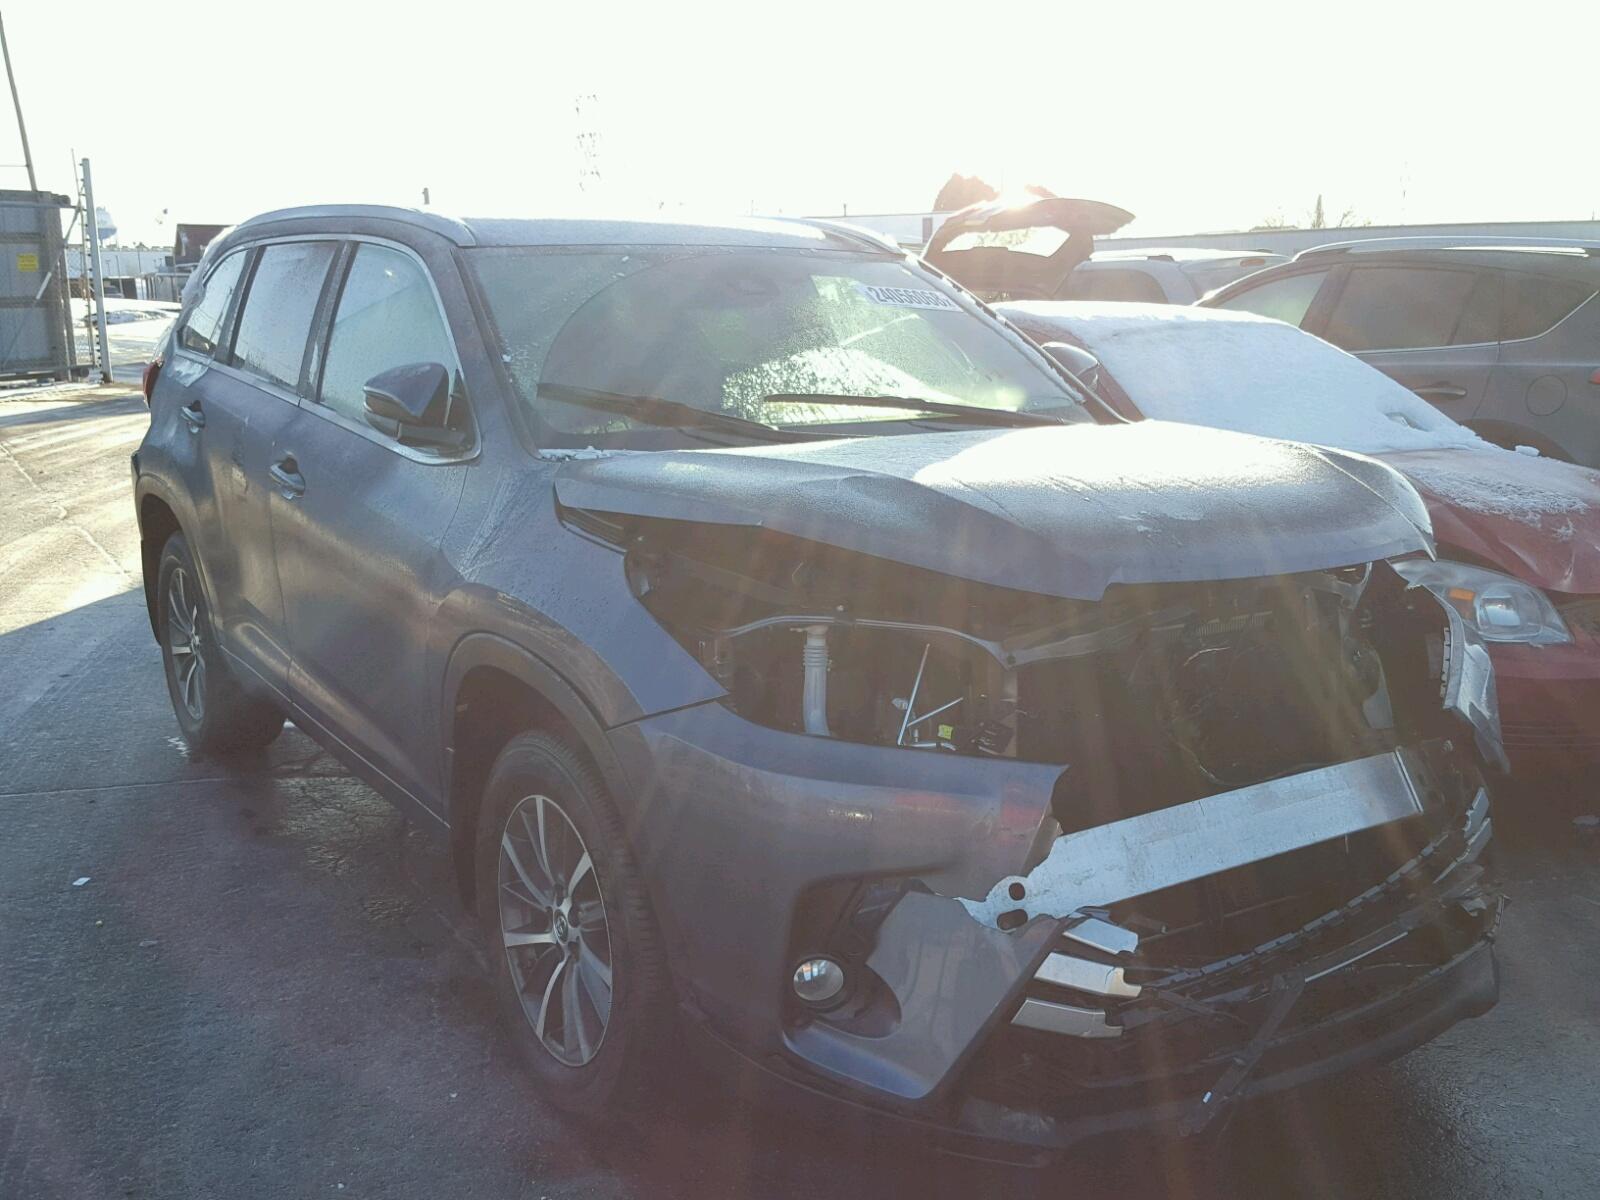 Auto Auction Ended On Vin 2t3bfrev7gw489535 2016 Toyota